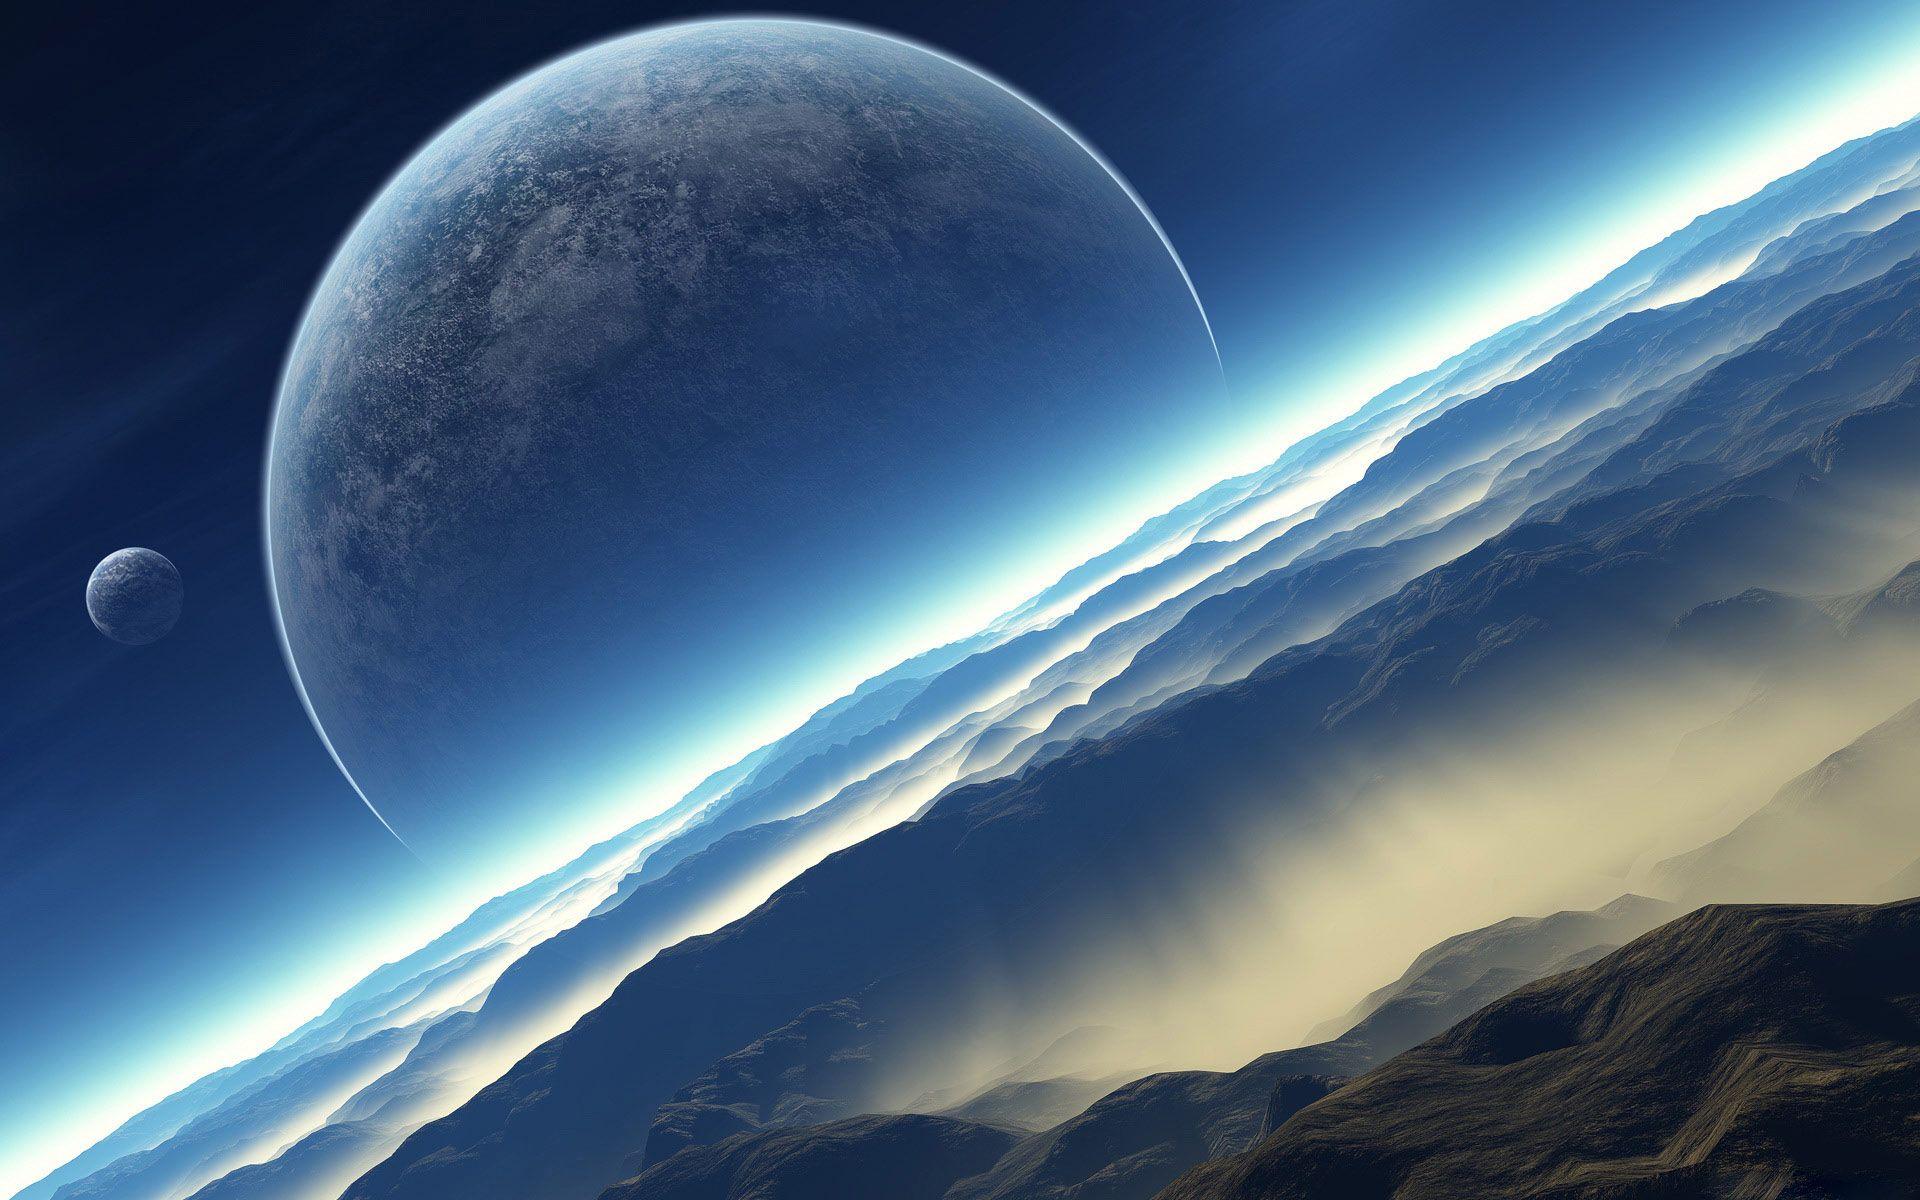 Solar Eclipse Space Art Wallpaper Outer Space Wallpaper